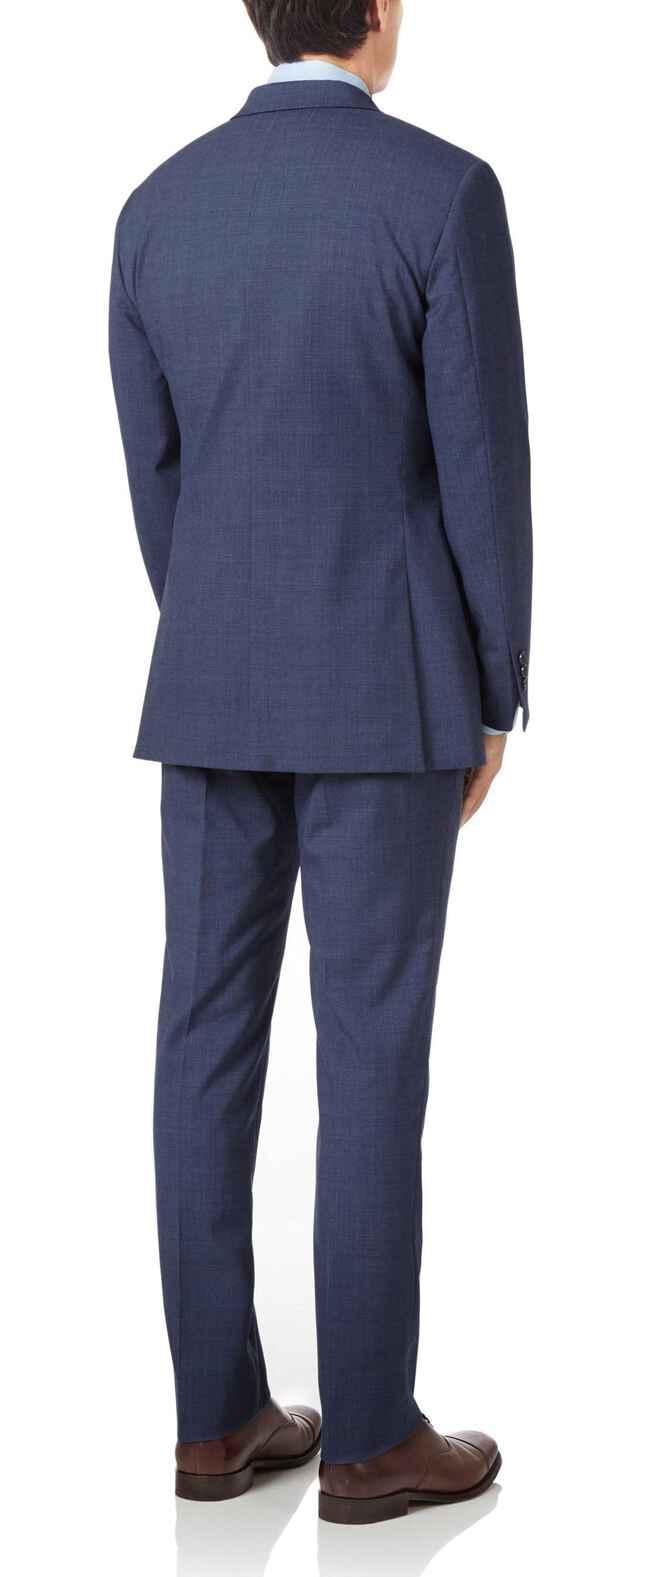 Slim Fit Businessanzug aus Panama-Gewebe mit Karos in Airforceblau